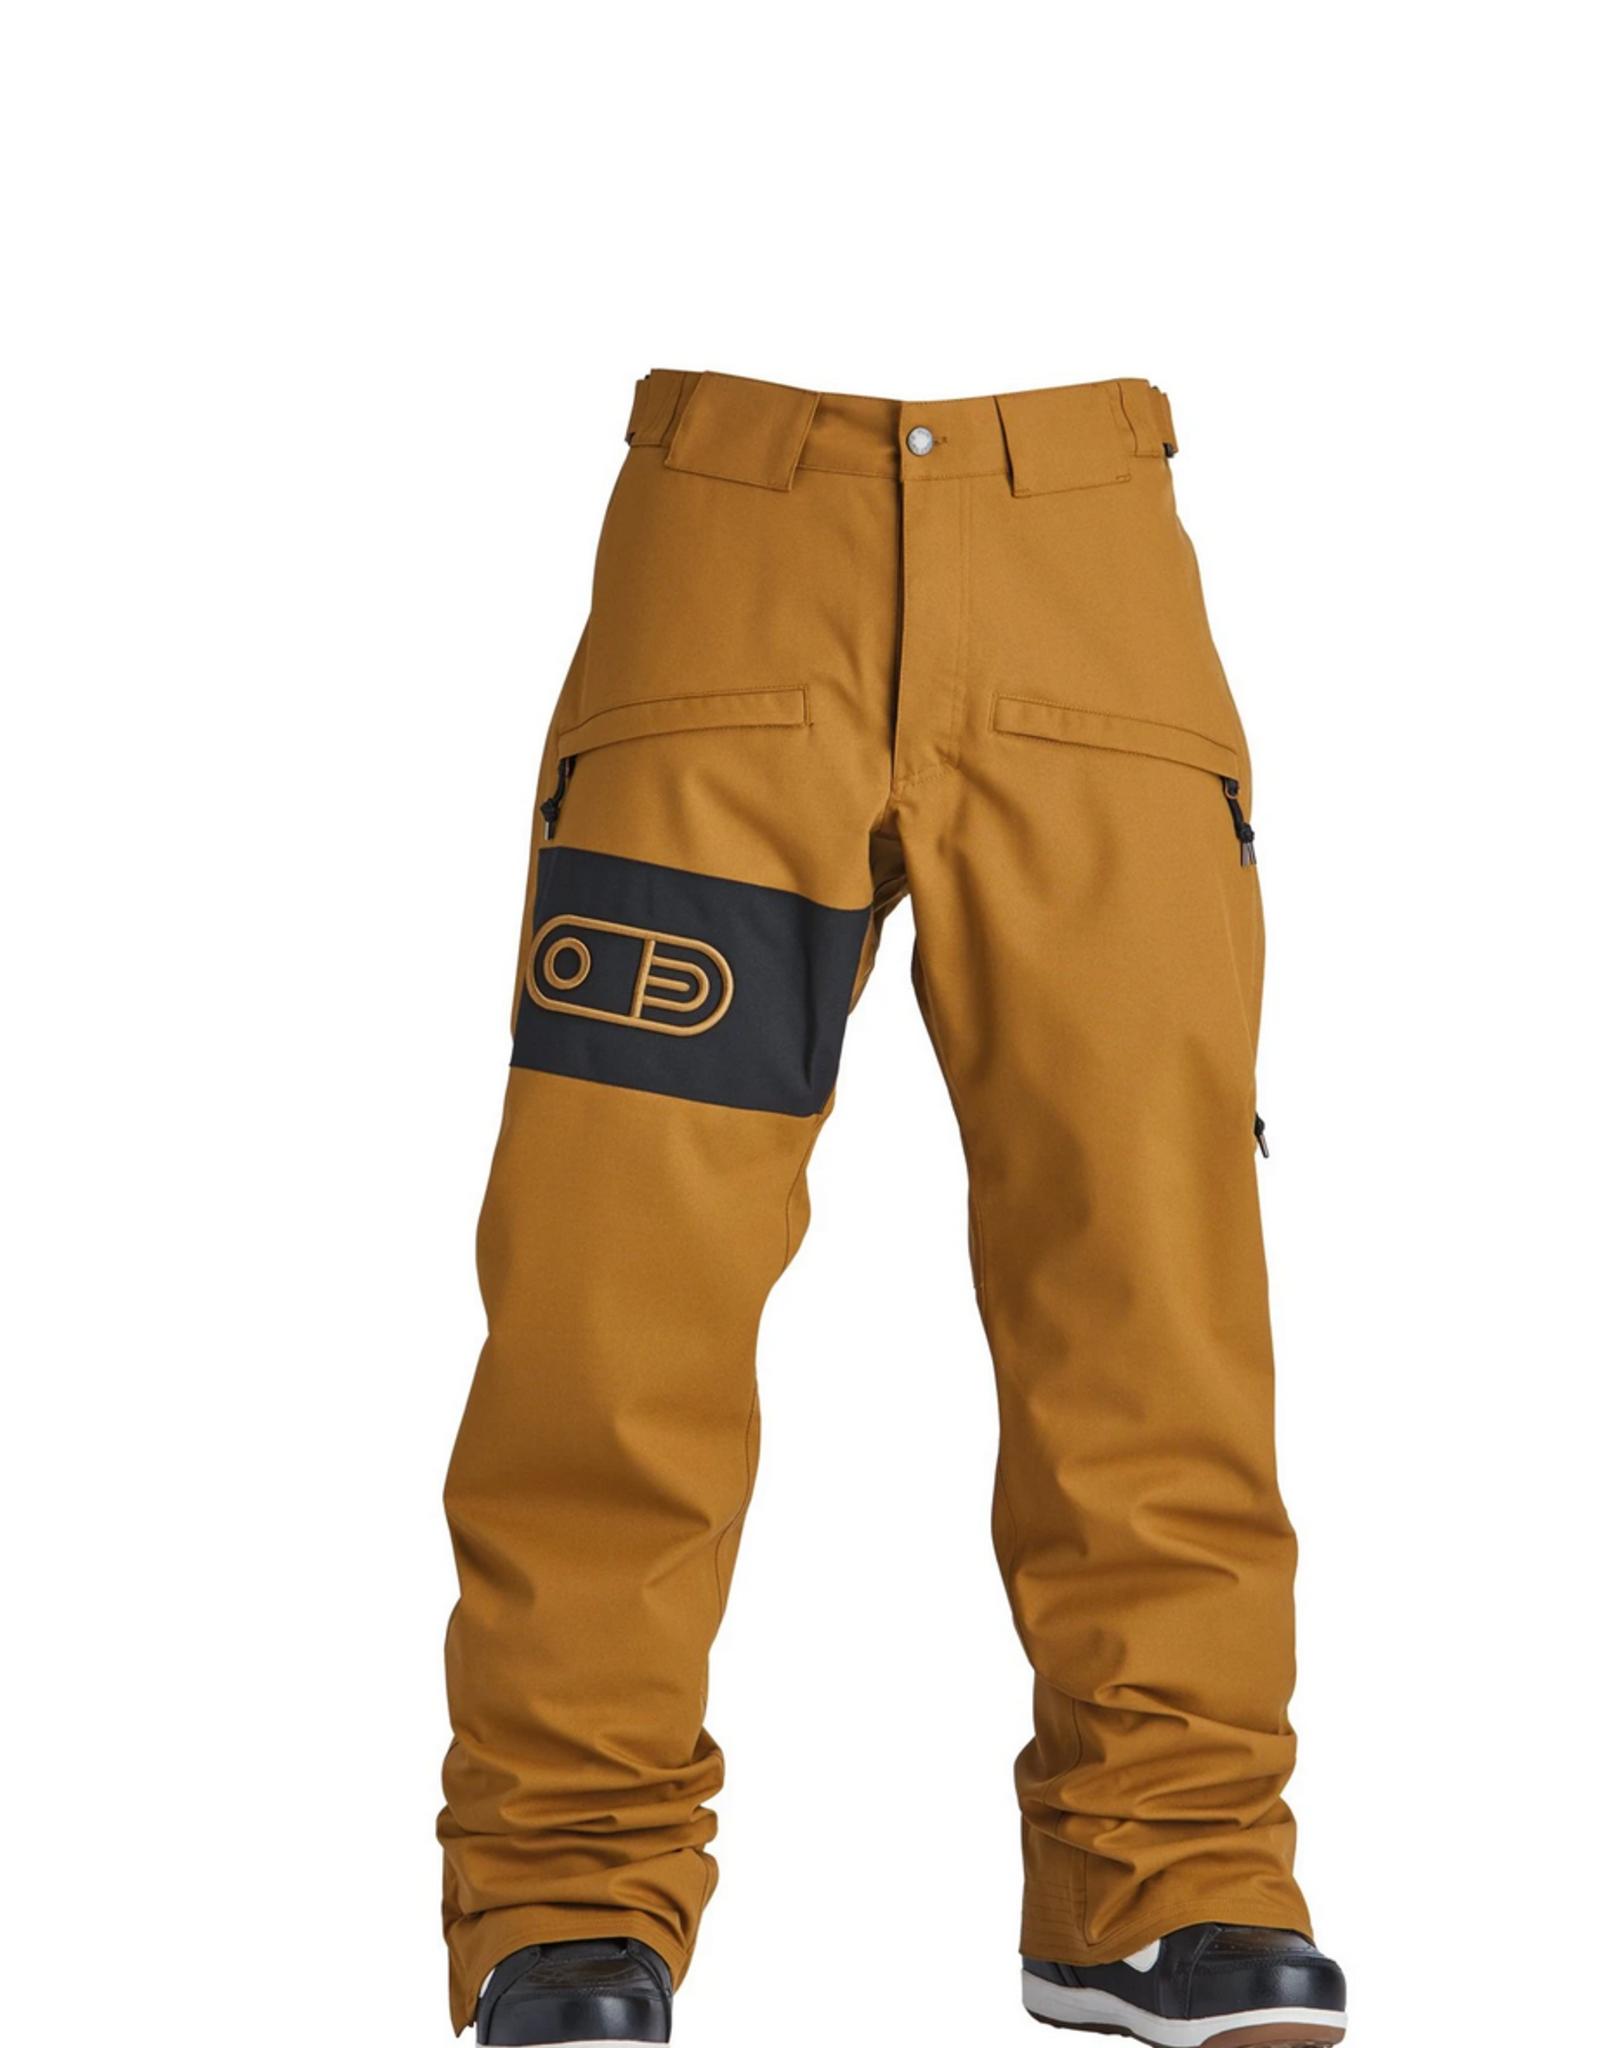 Airblaster Airblaster Hip Bag Pant